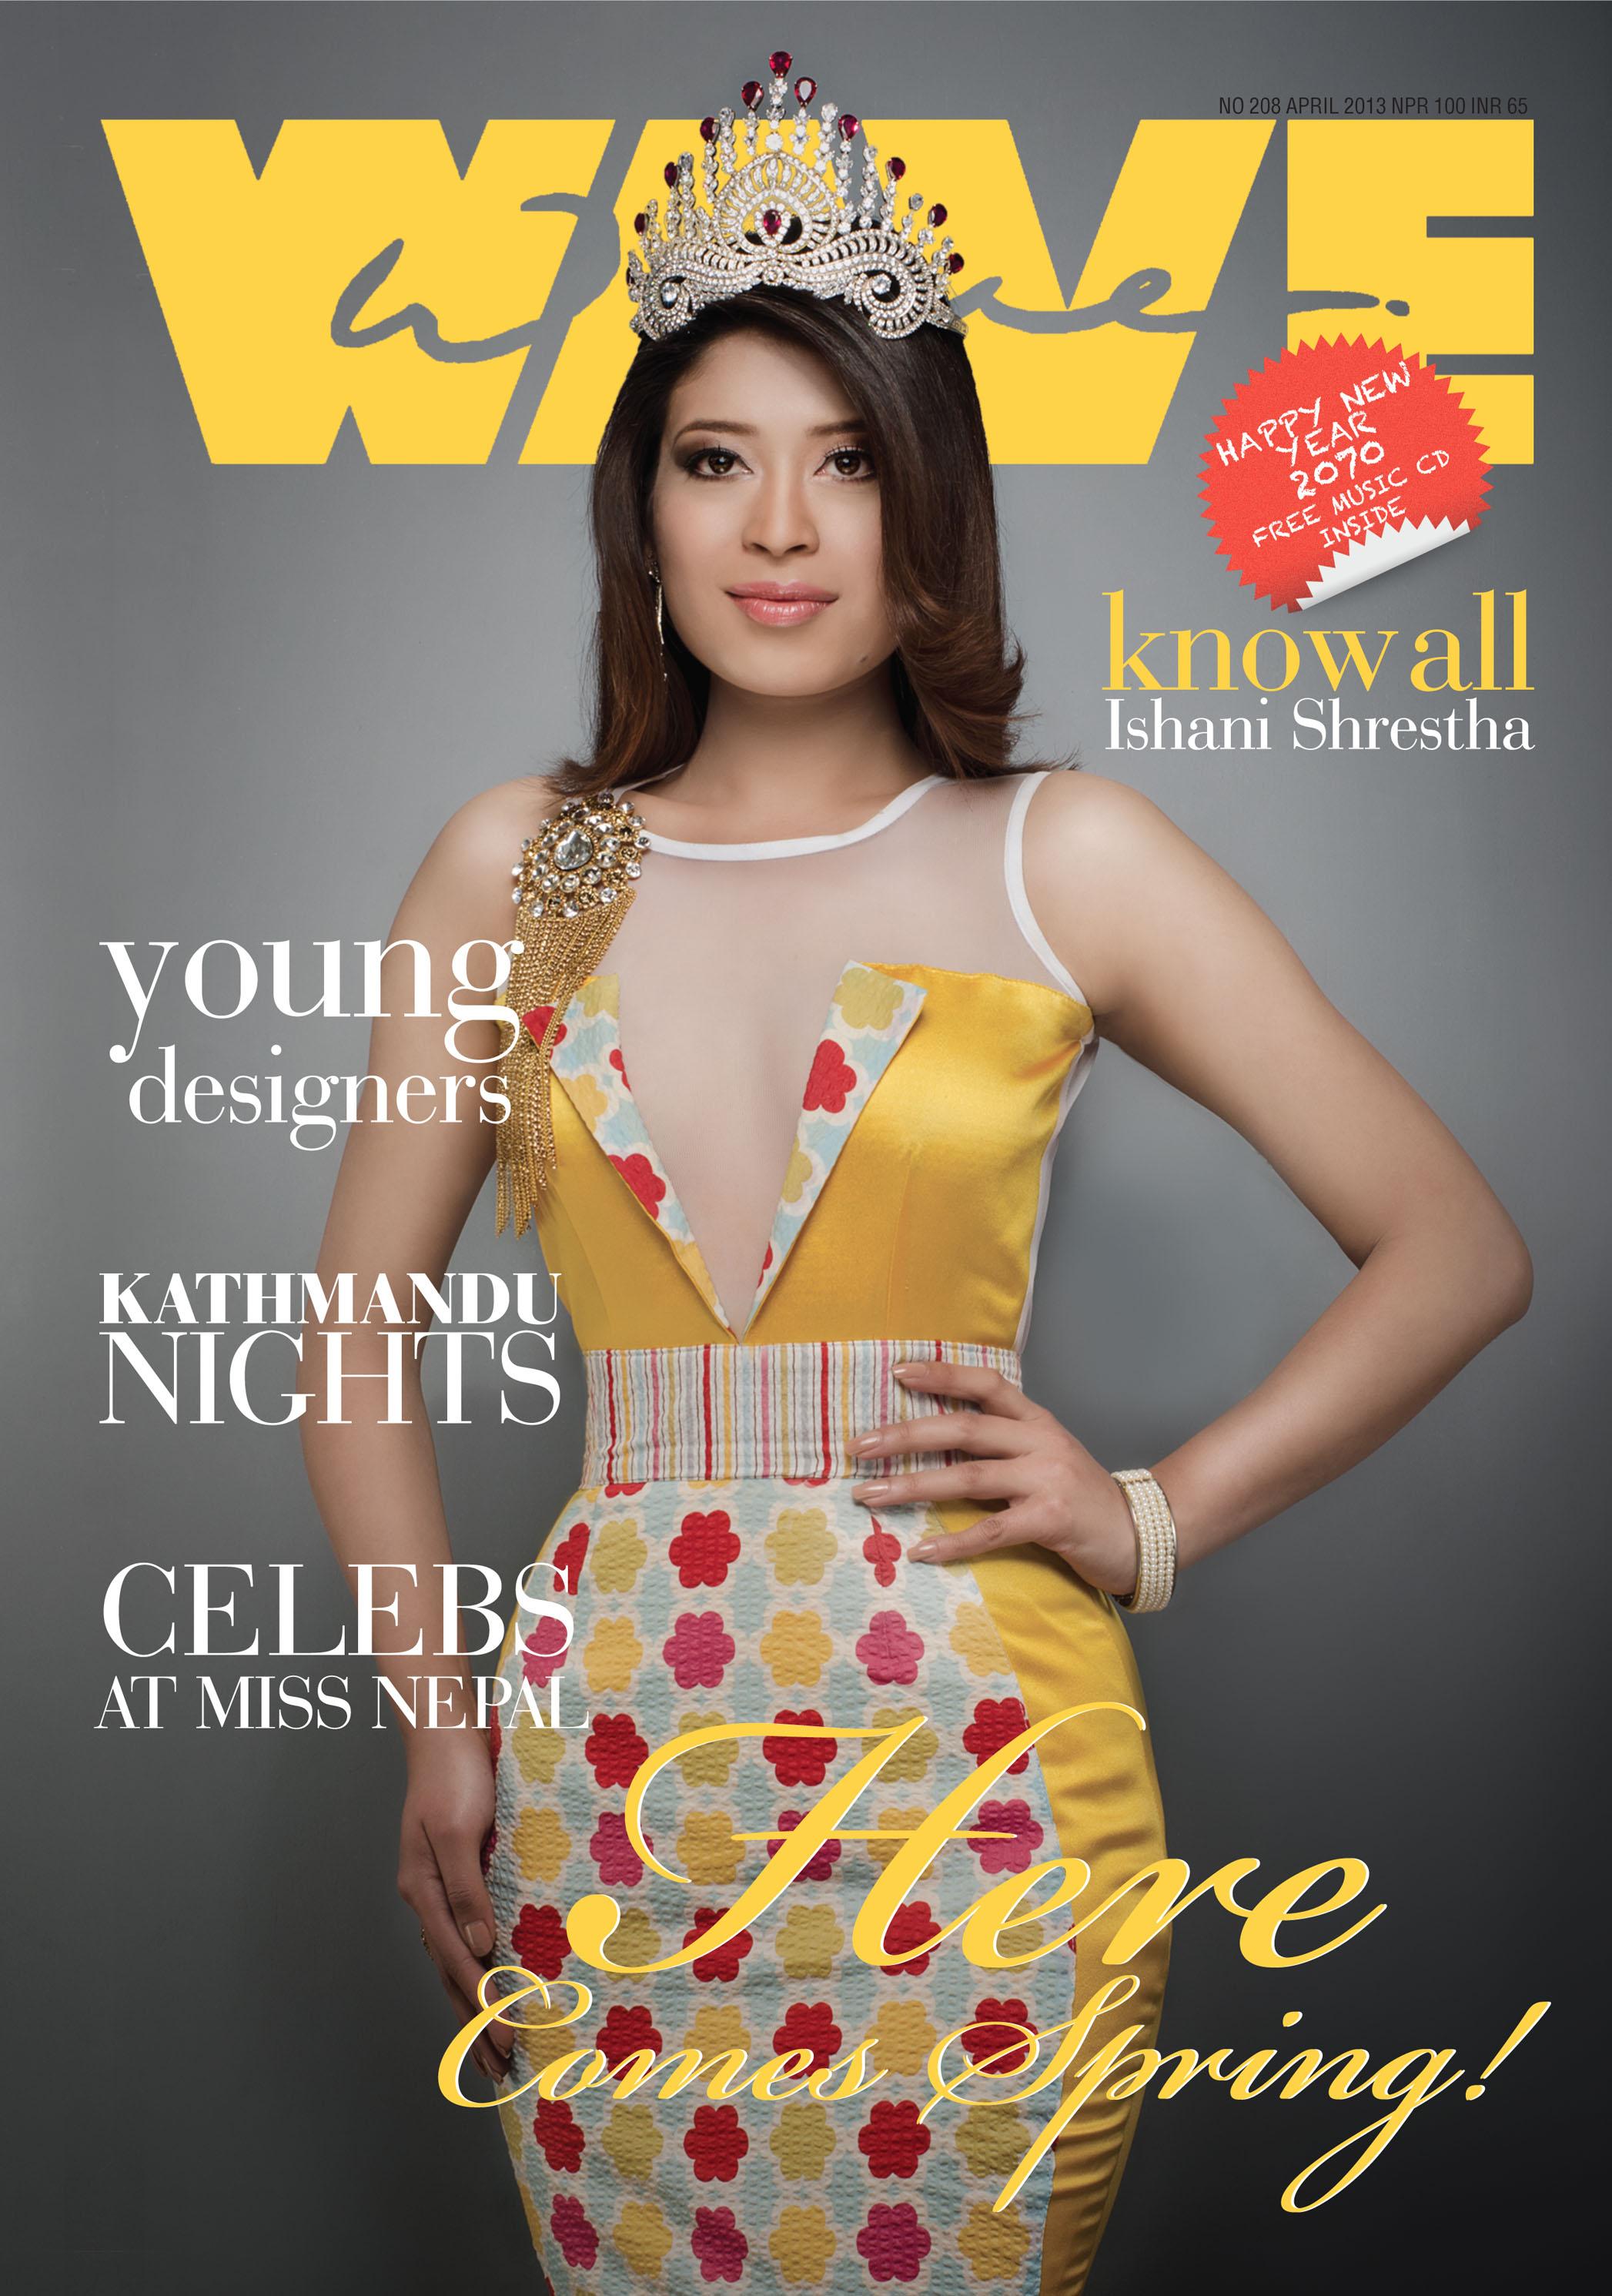 Miss Nepal 2013 Ishani Shrestha on WAVE